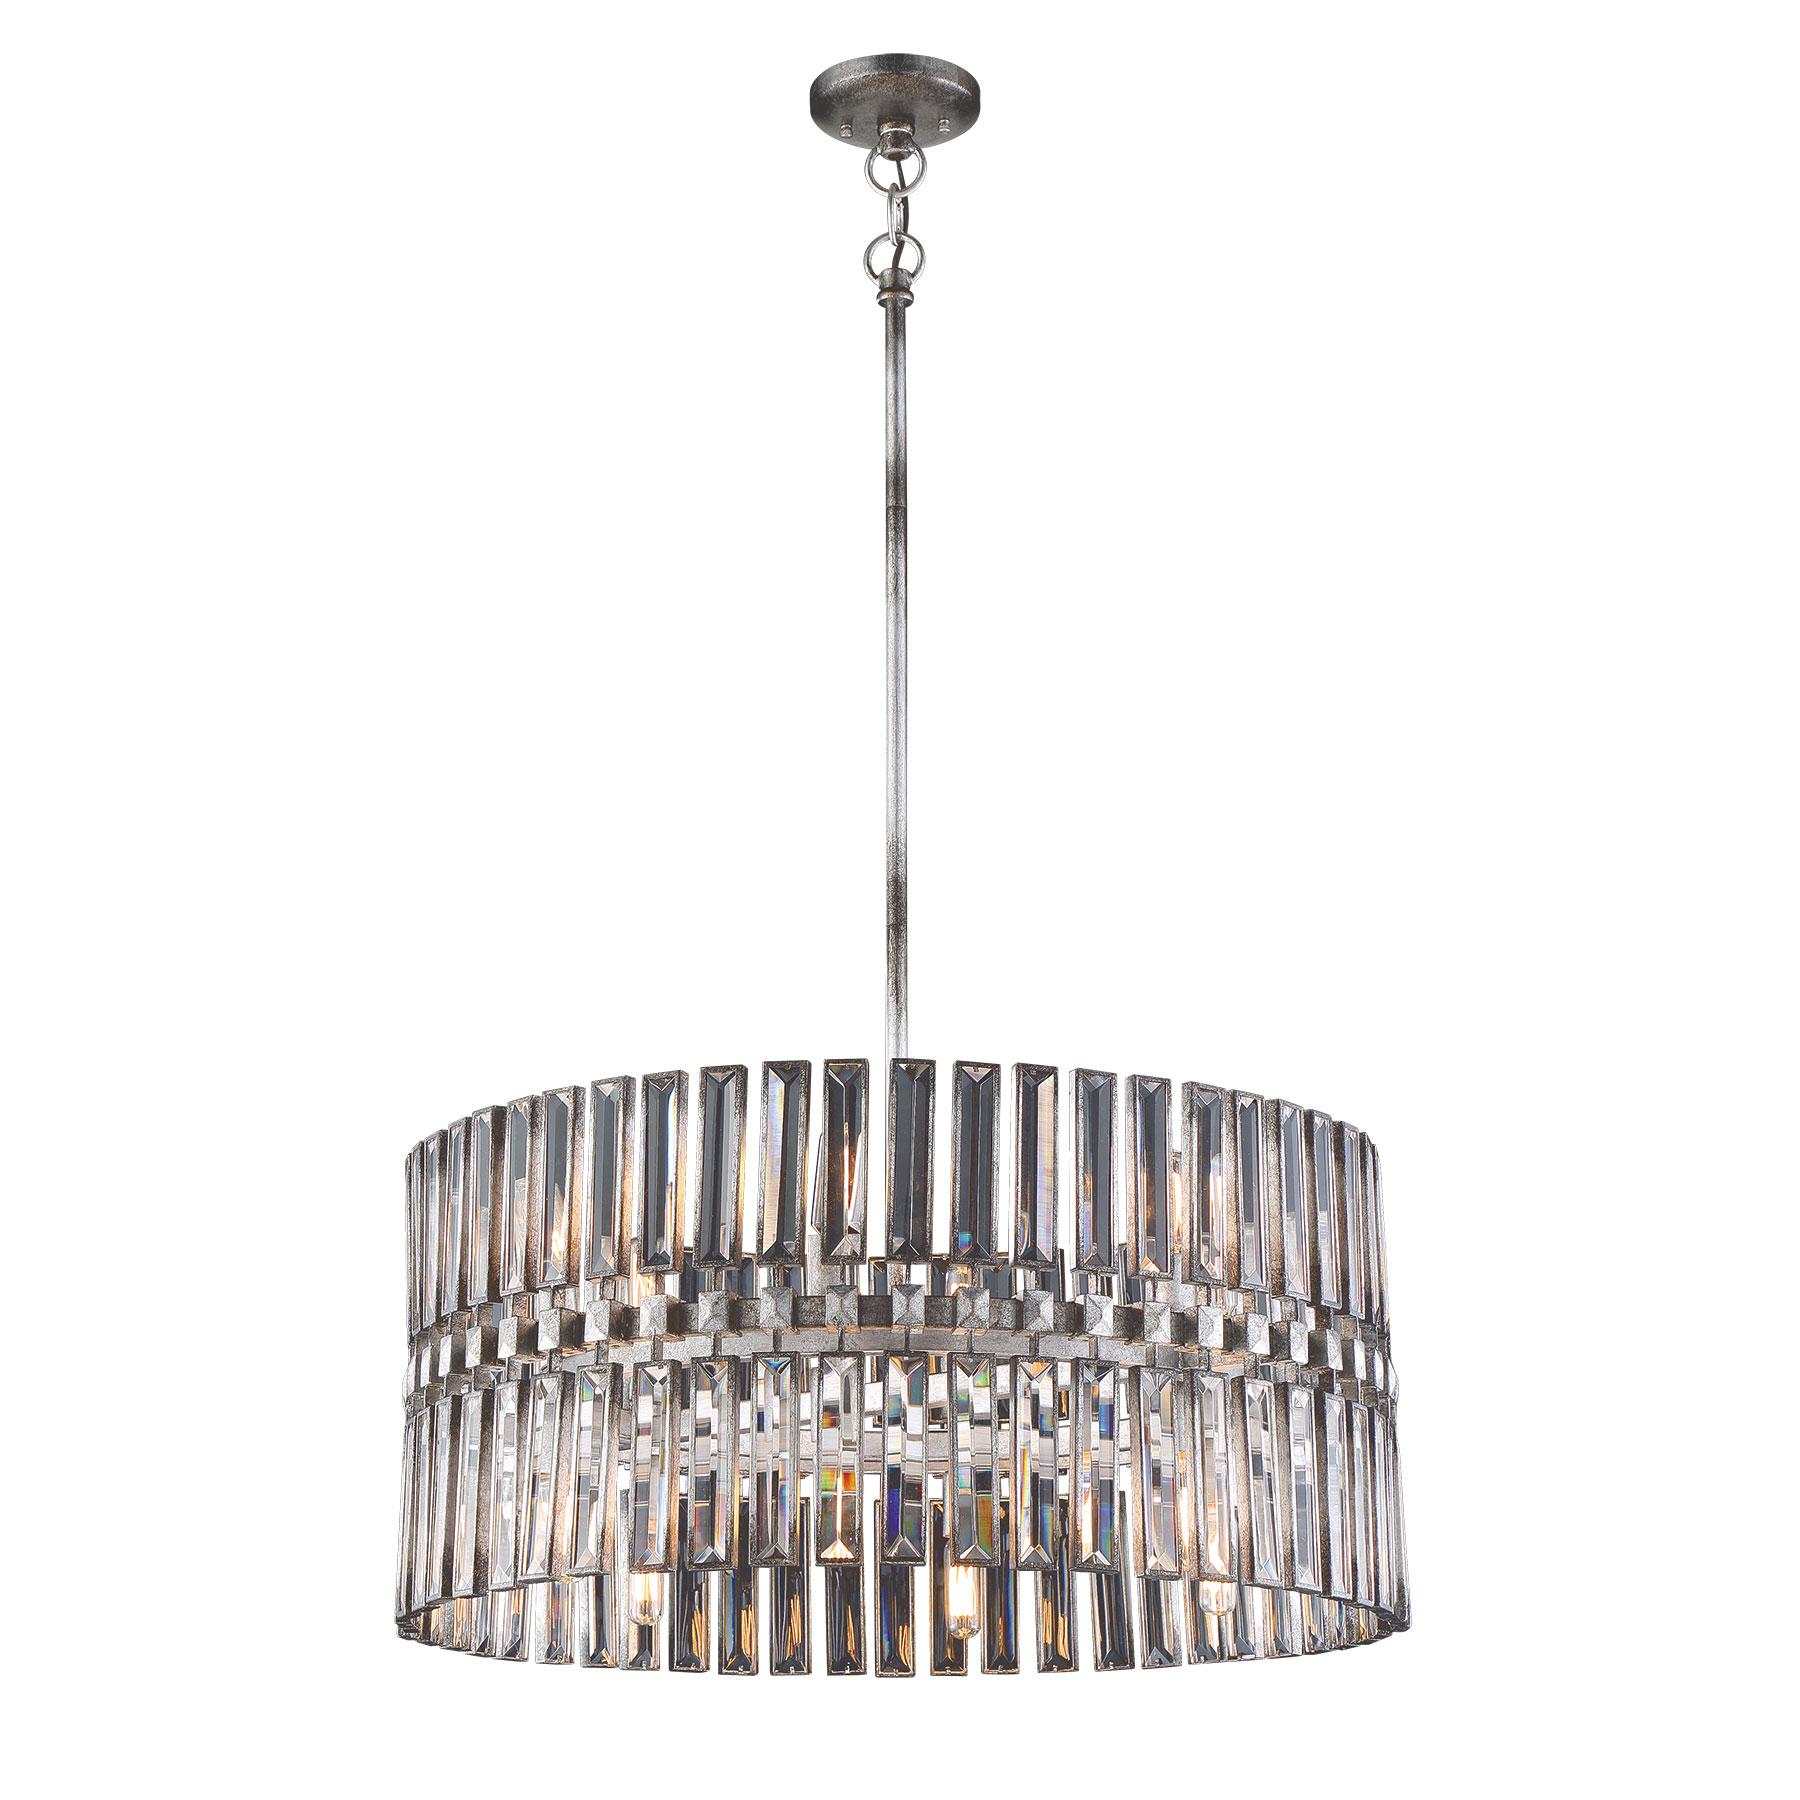 Minka Group® :: Brands :: Metropolitan® :: N7712-700 intended for Aurore 4-Light Crystal Chandeliers (Image 22 of 30)